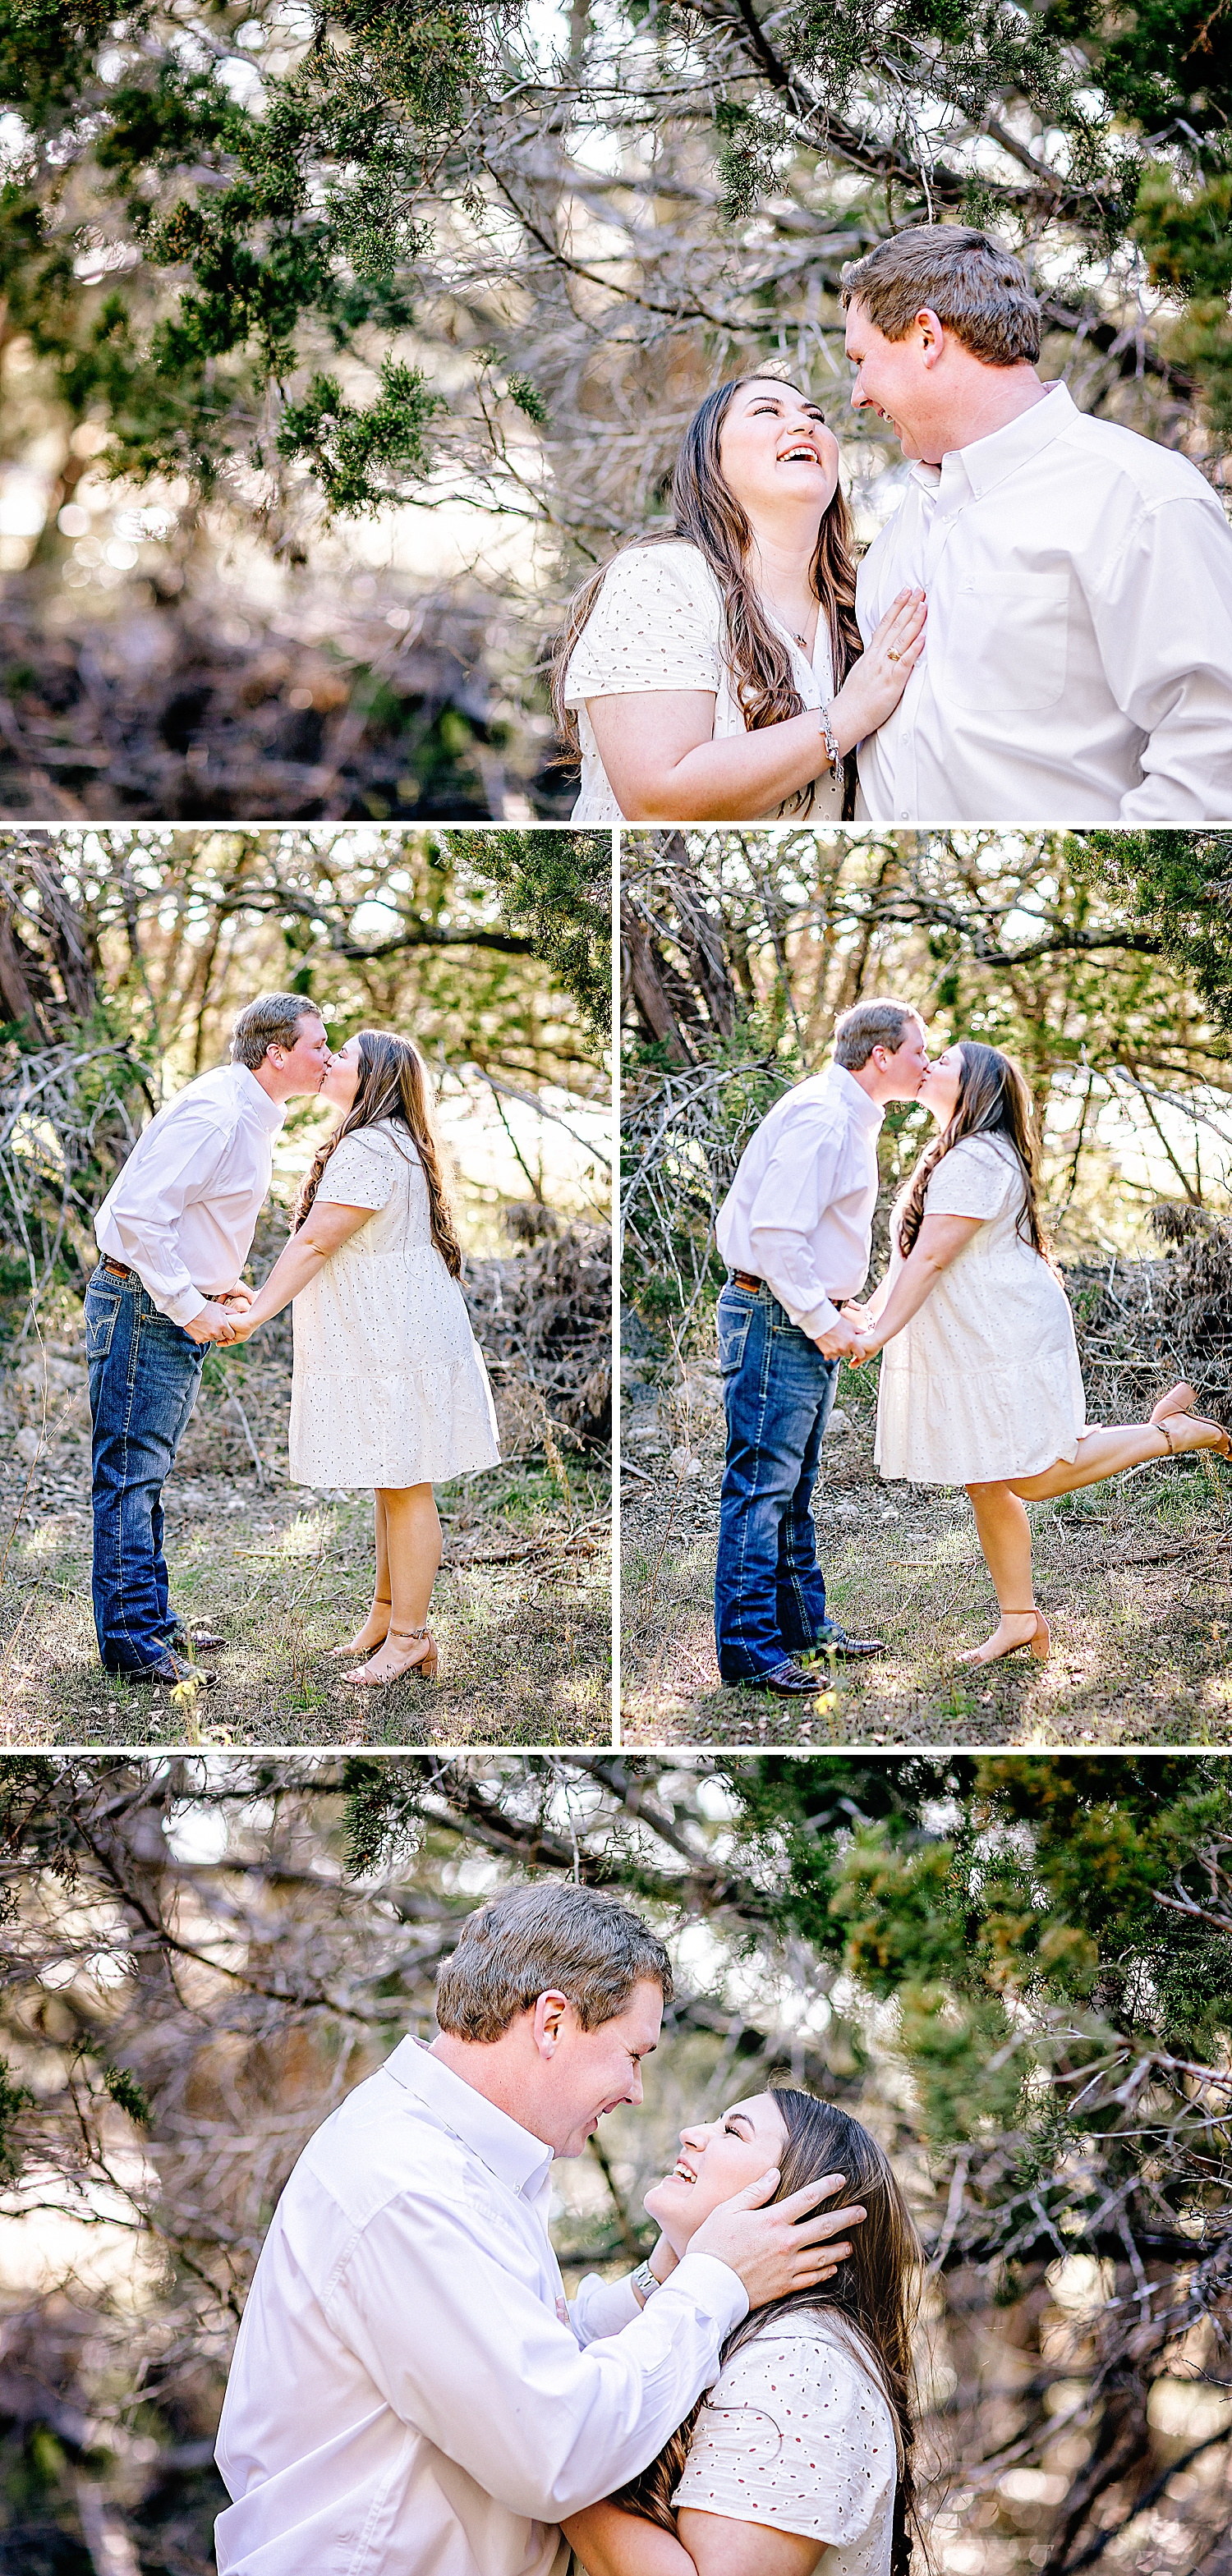 Engagement-photo-session-Western-Sky-wedding-venue-bulverde-texas-carly-barton-photography_0006.jpg